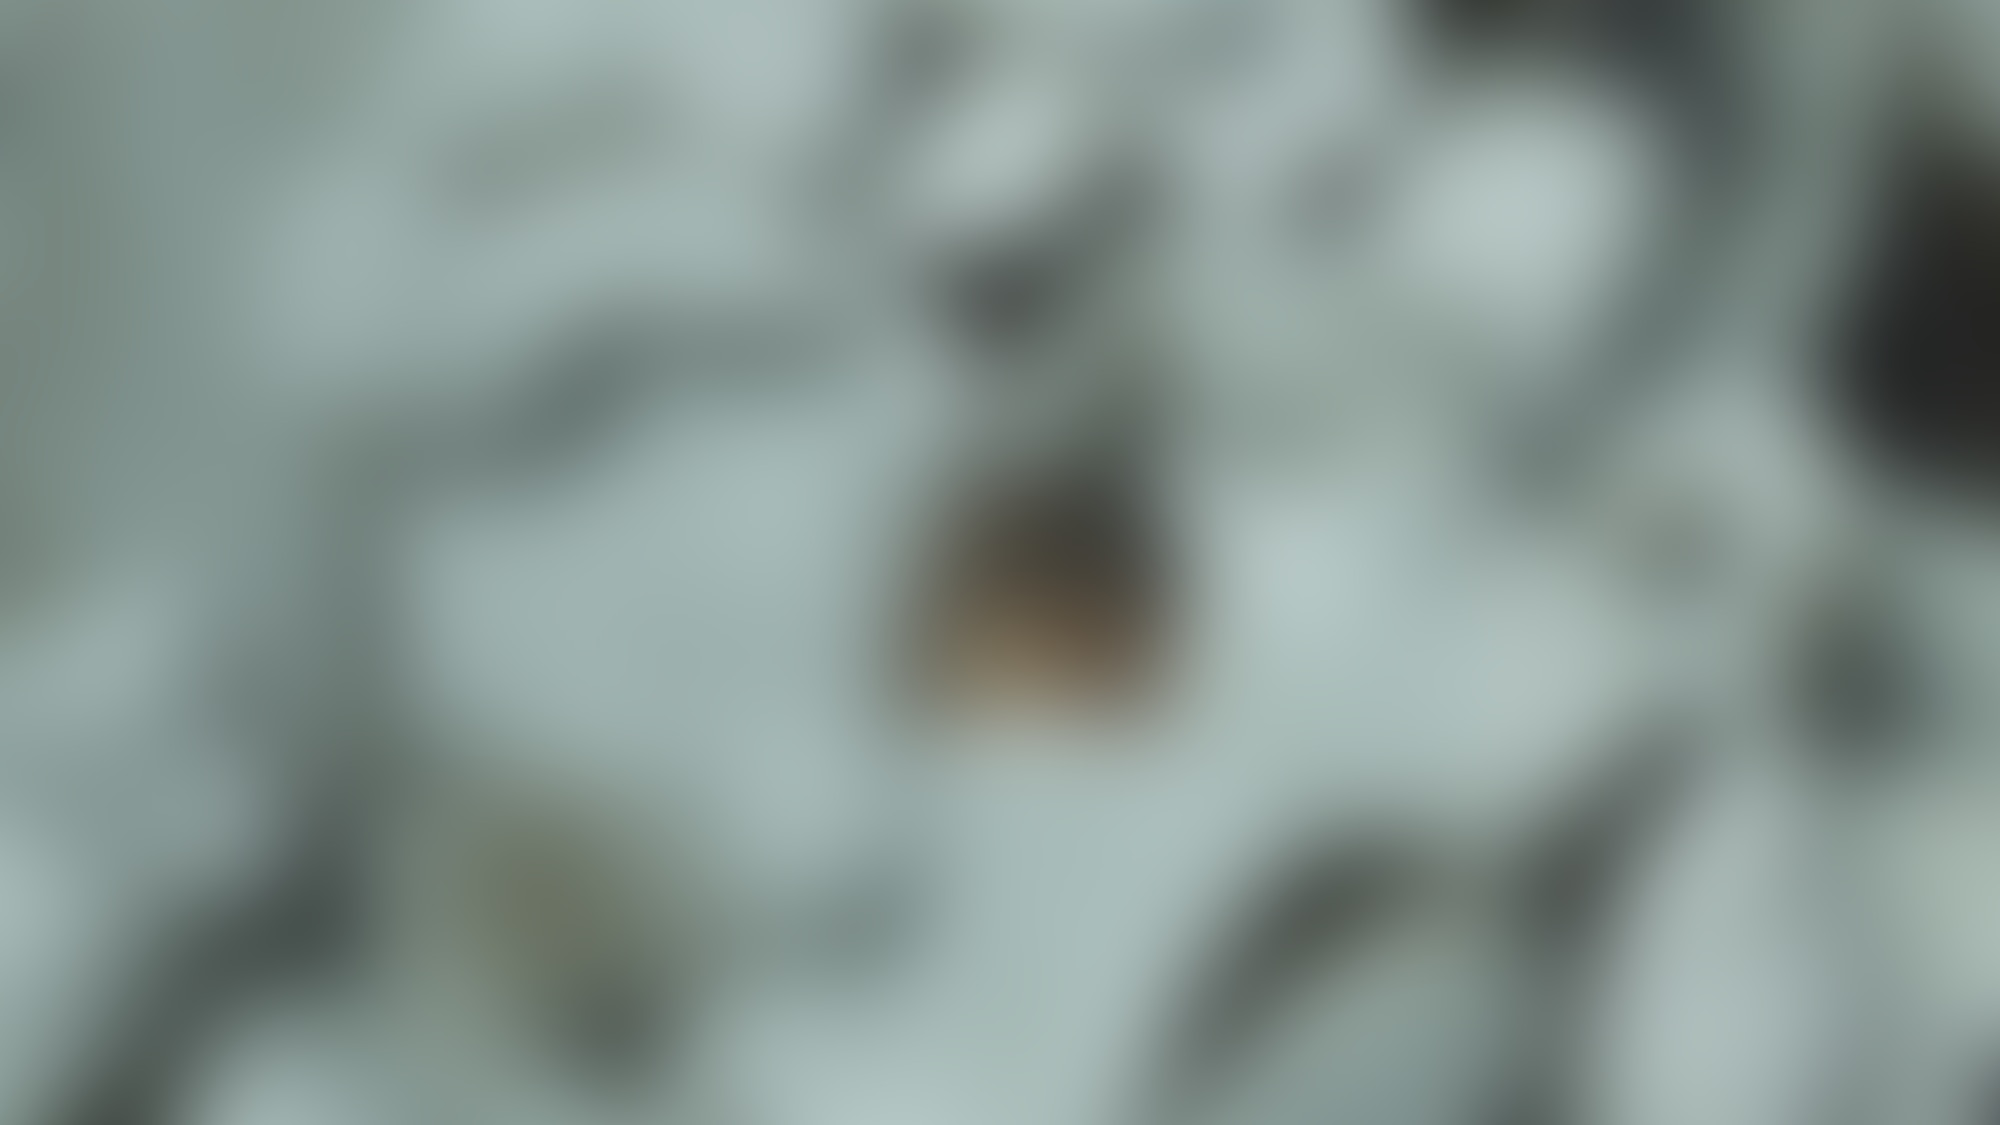 Dawit nm film photography lectureinprogress 02 autocompressfitresizeixlibphp 1 1 0max h2000max w3 D2000q80s4233ebaed720b019636e6c1feffc883f